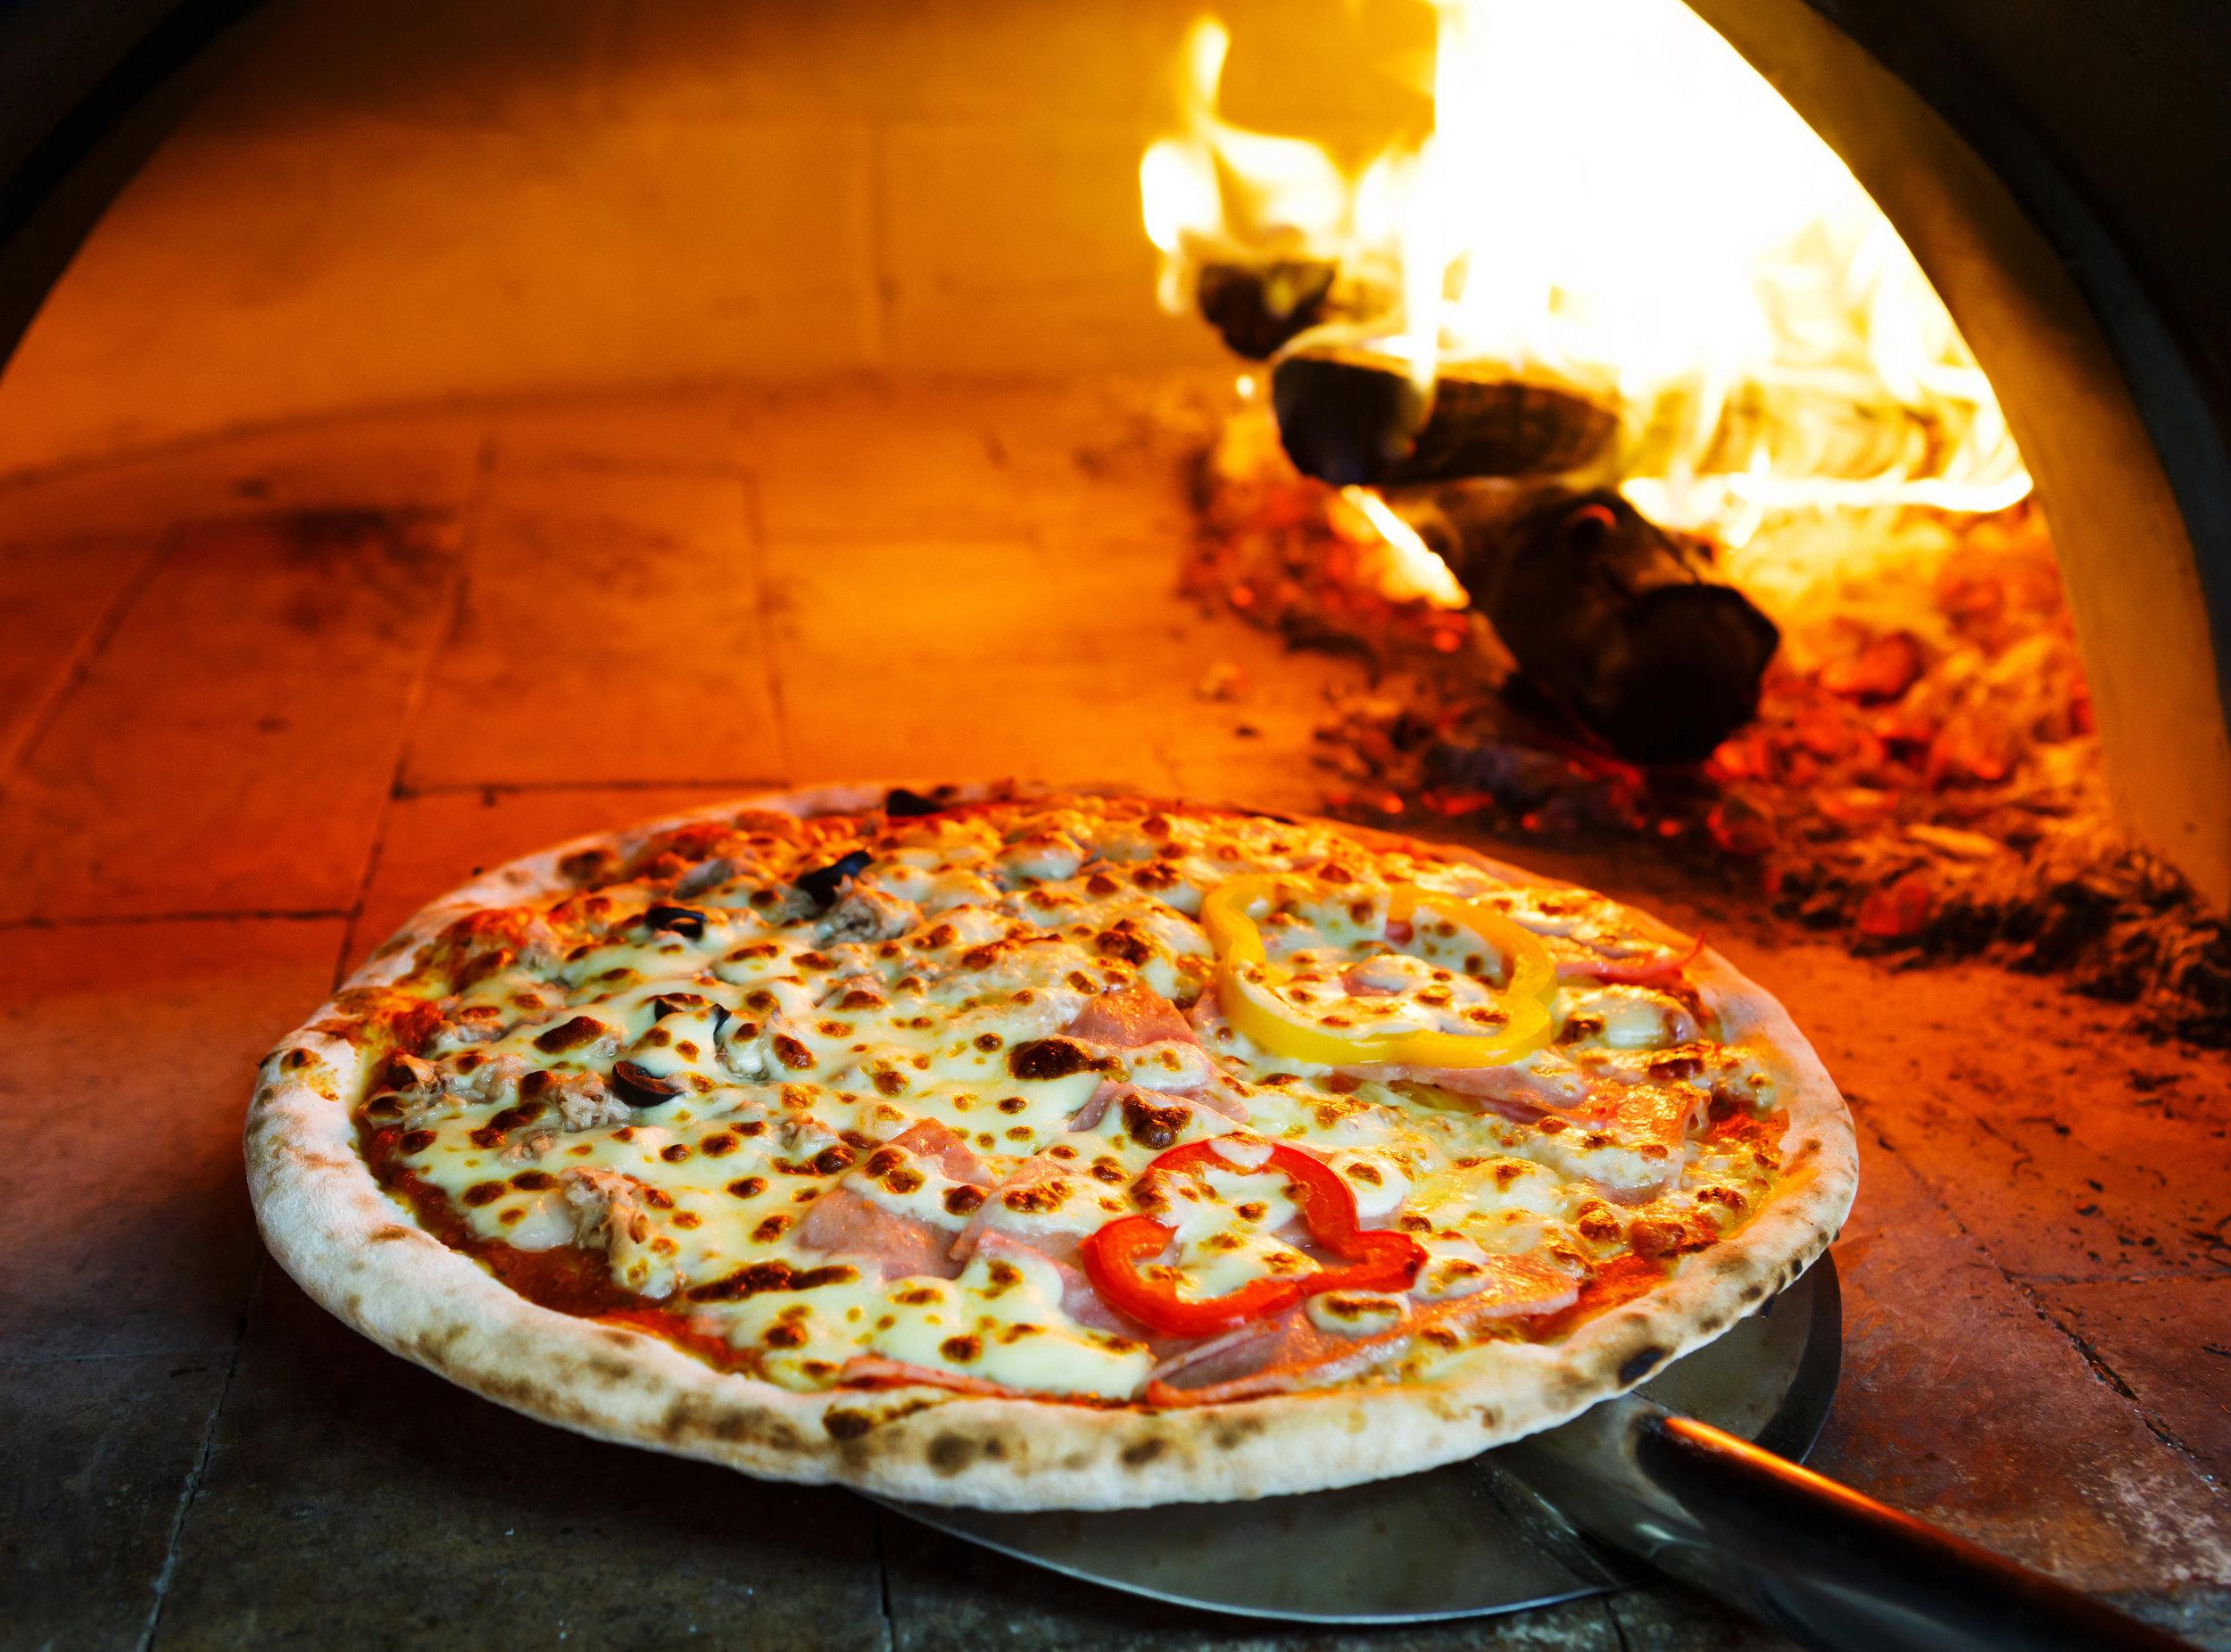 Boca Pizzeria at The Village at Corte Madera